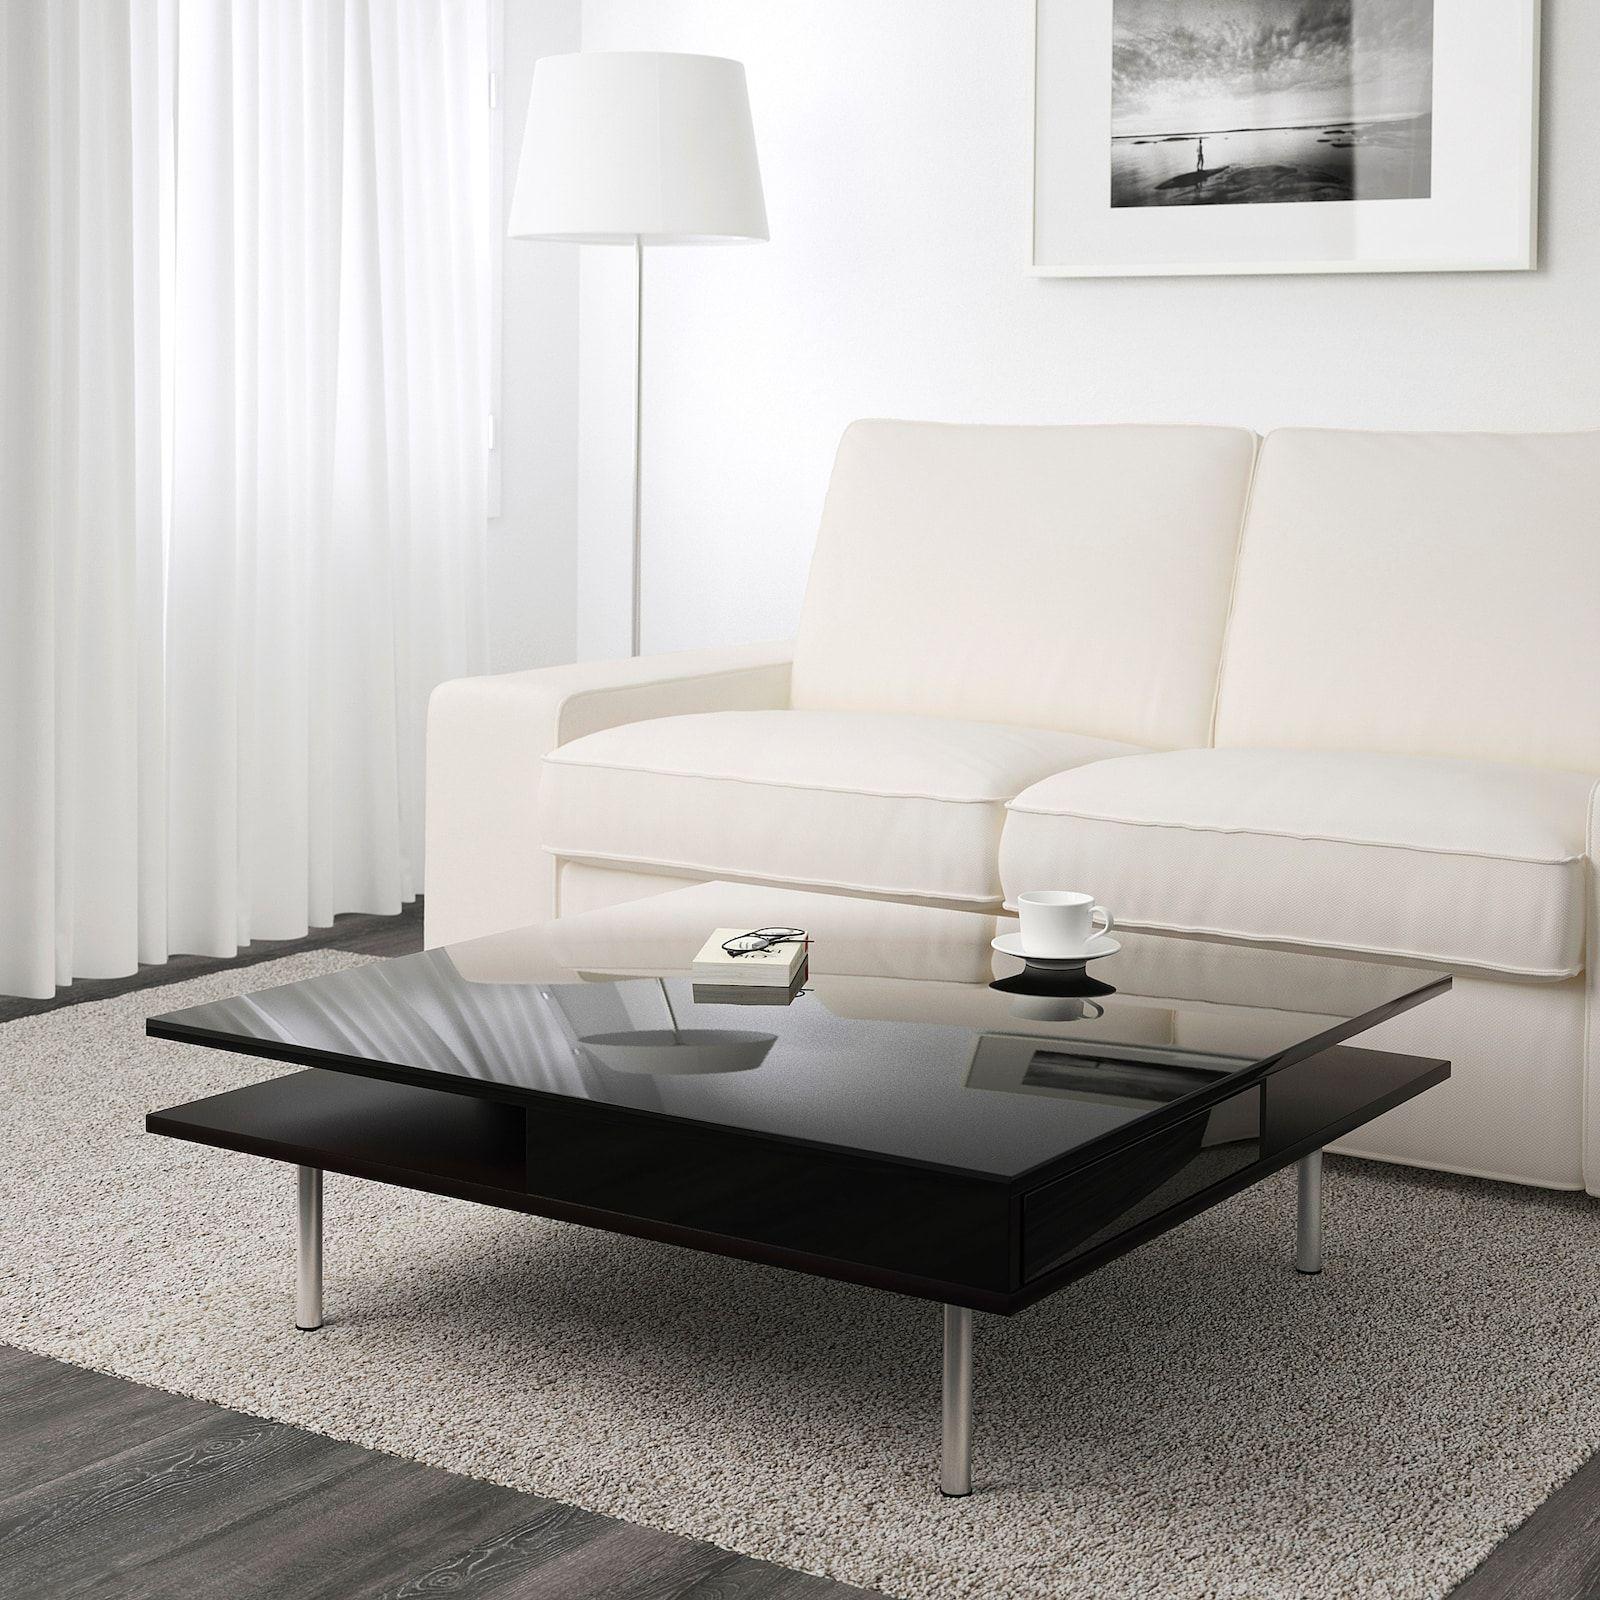 TOFTERYD Coffee table, high gloss black, 37 3/8x37 3/8